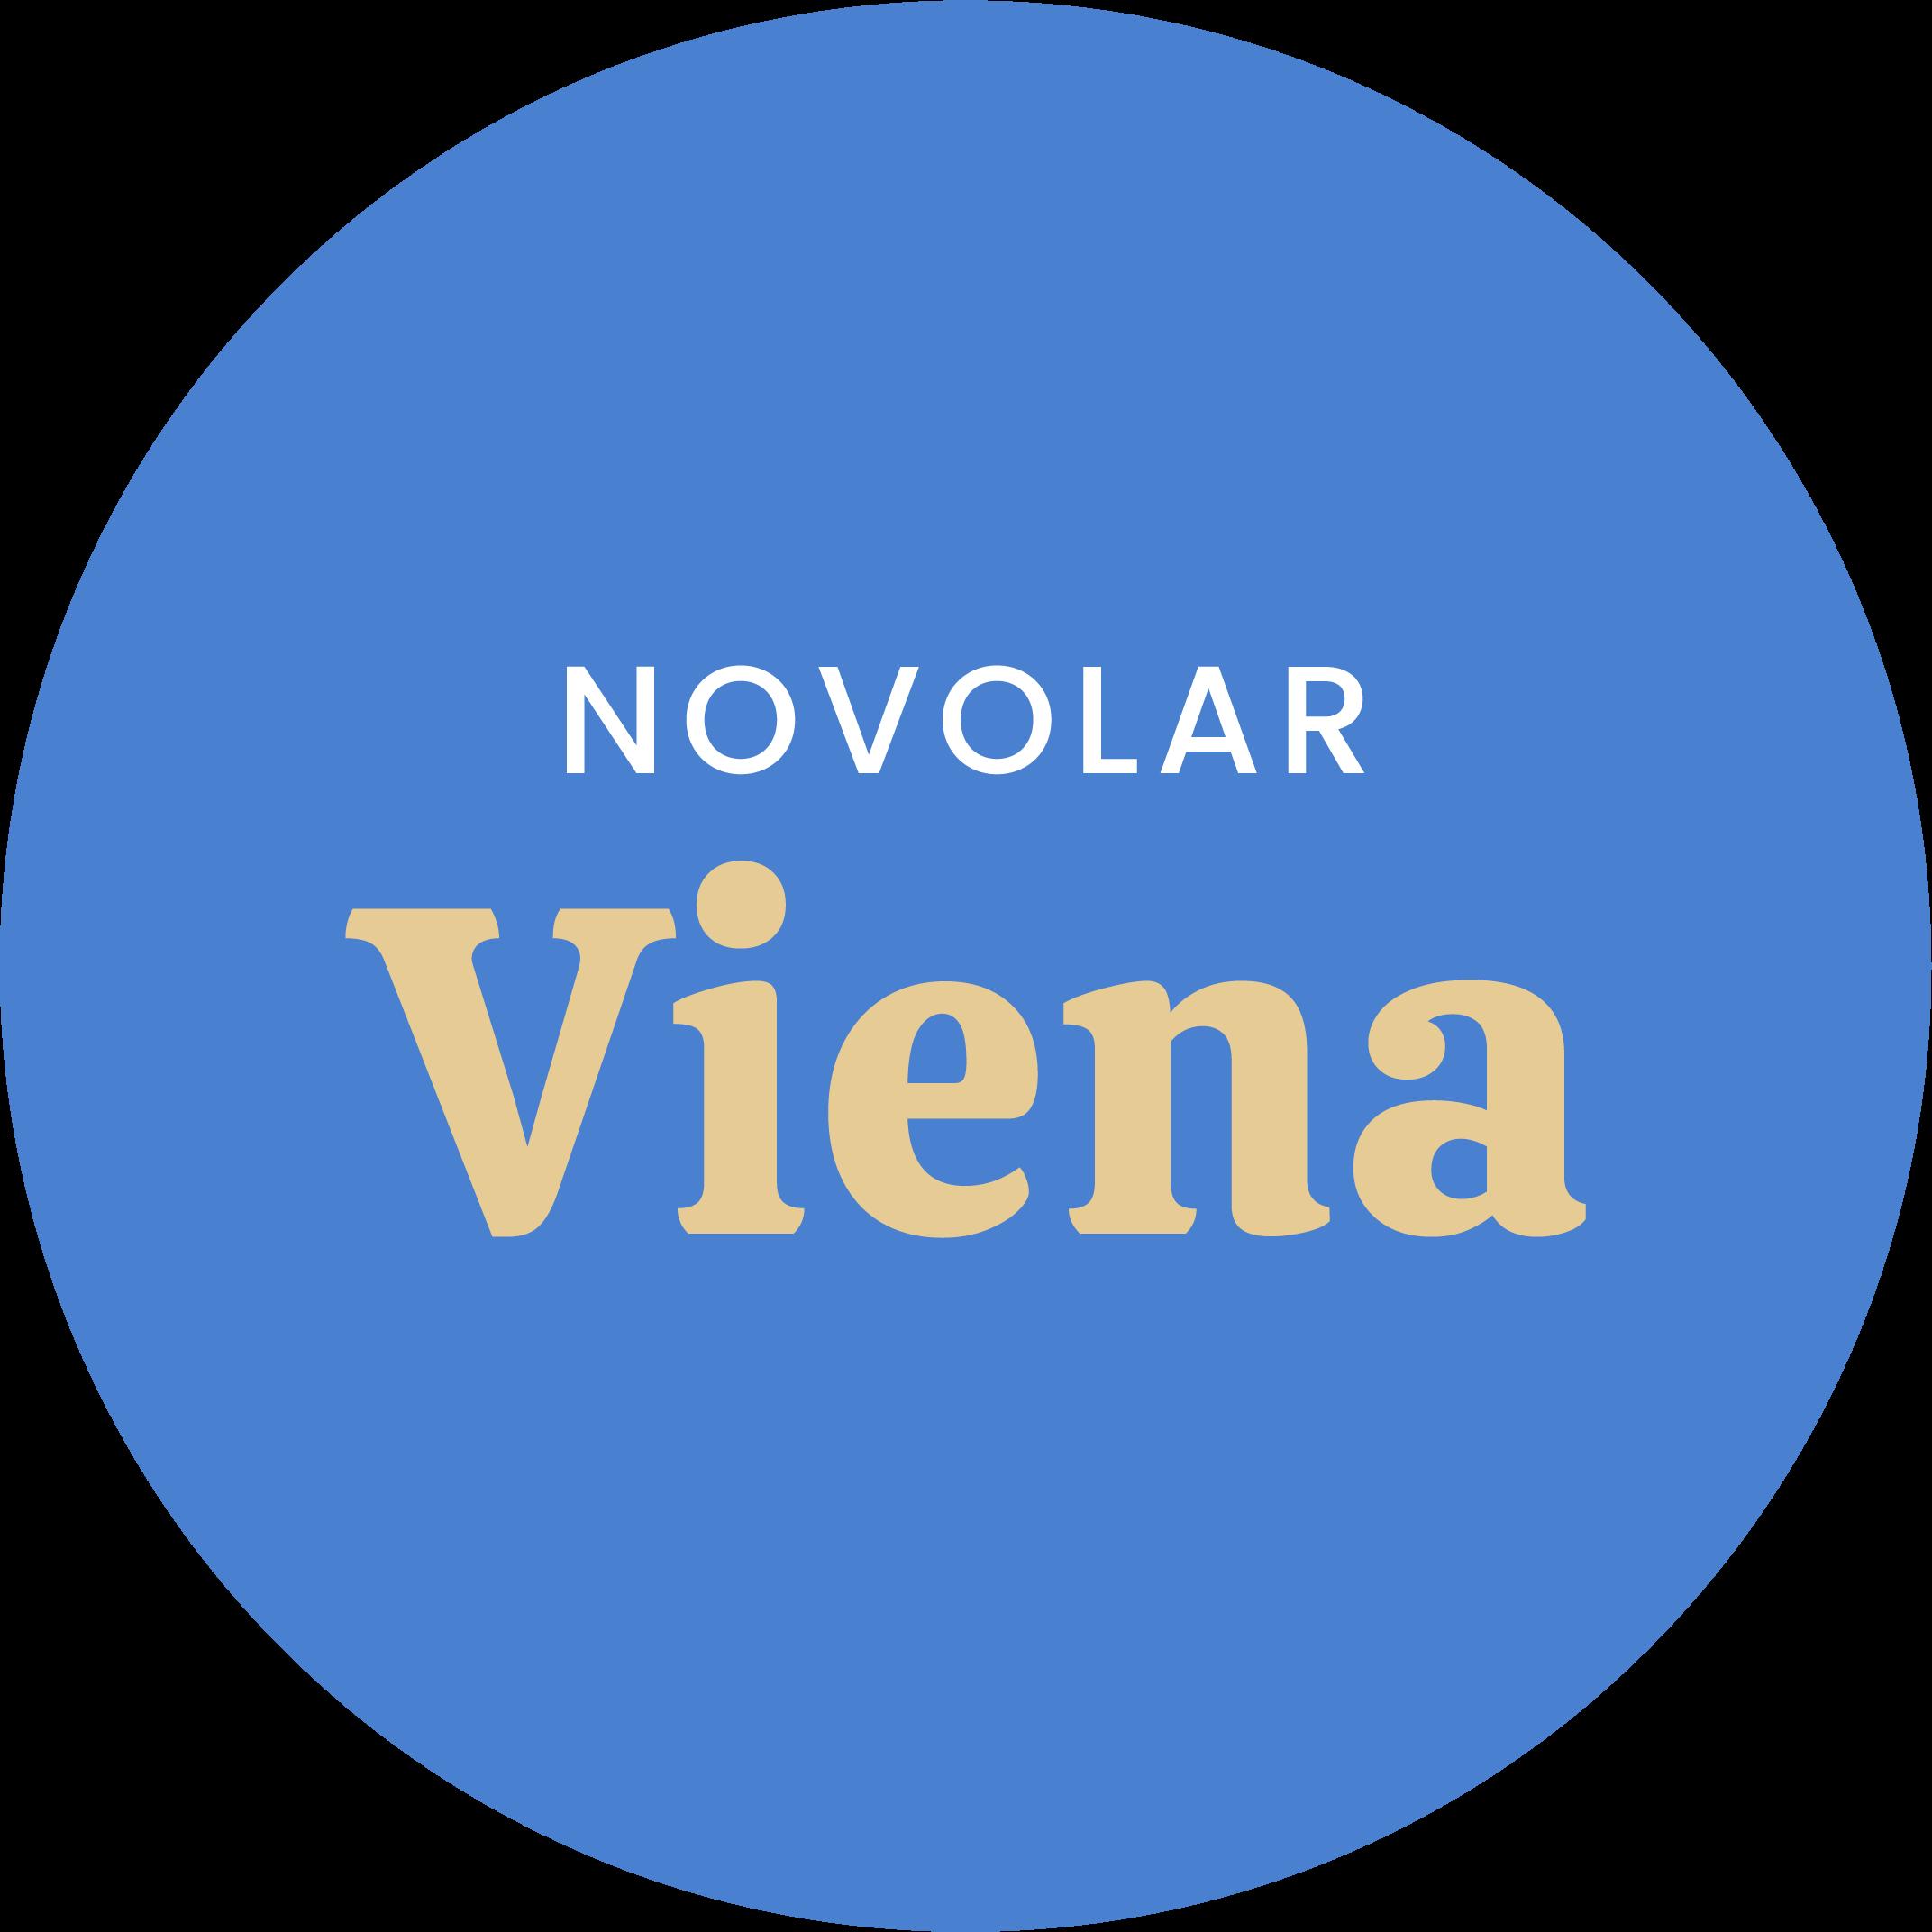 Novolar Viena